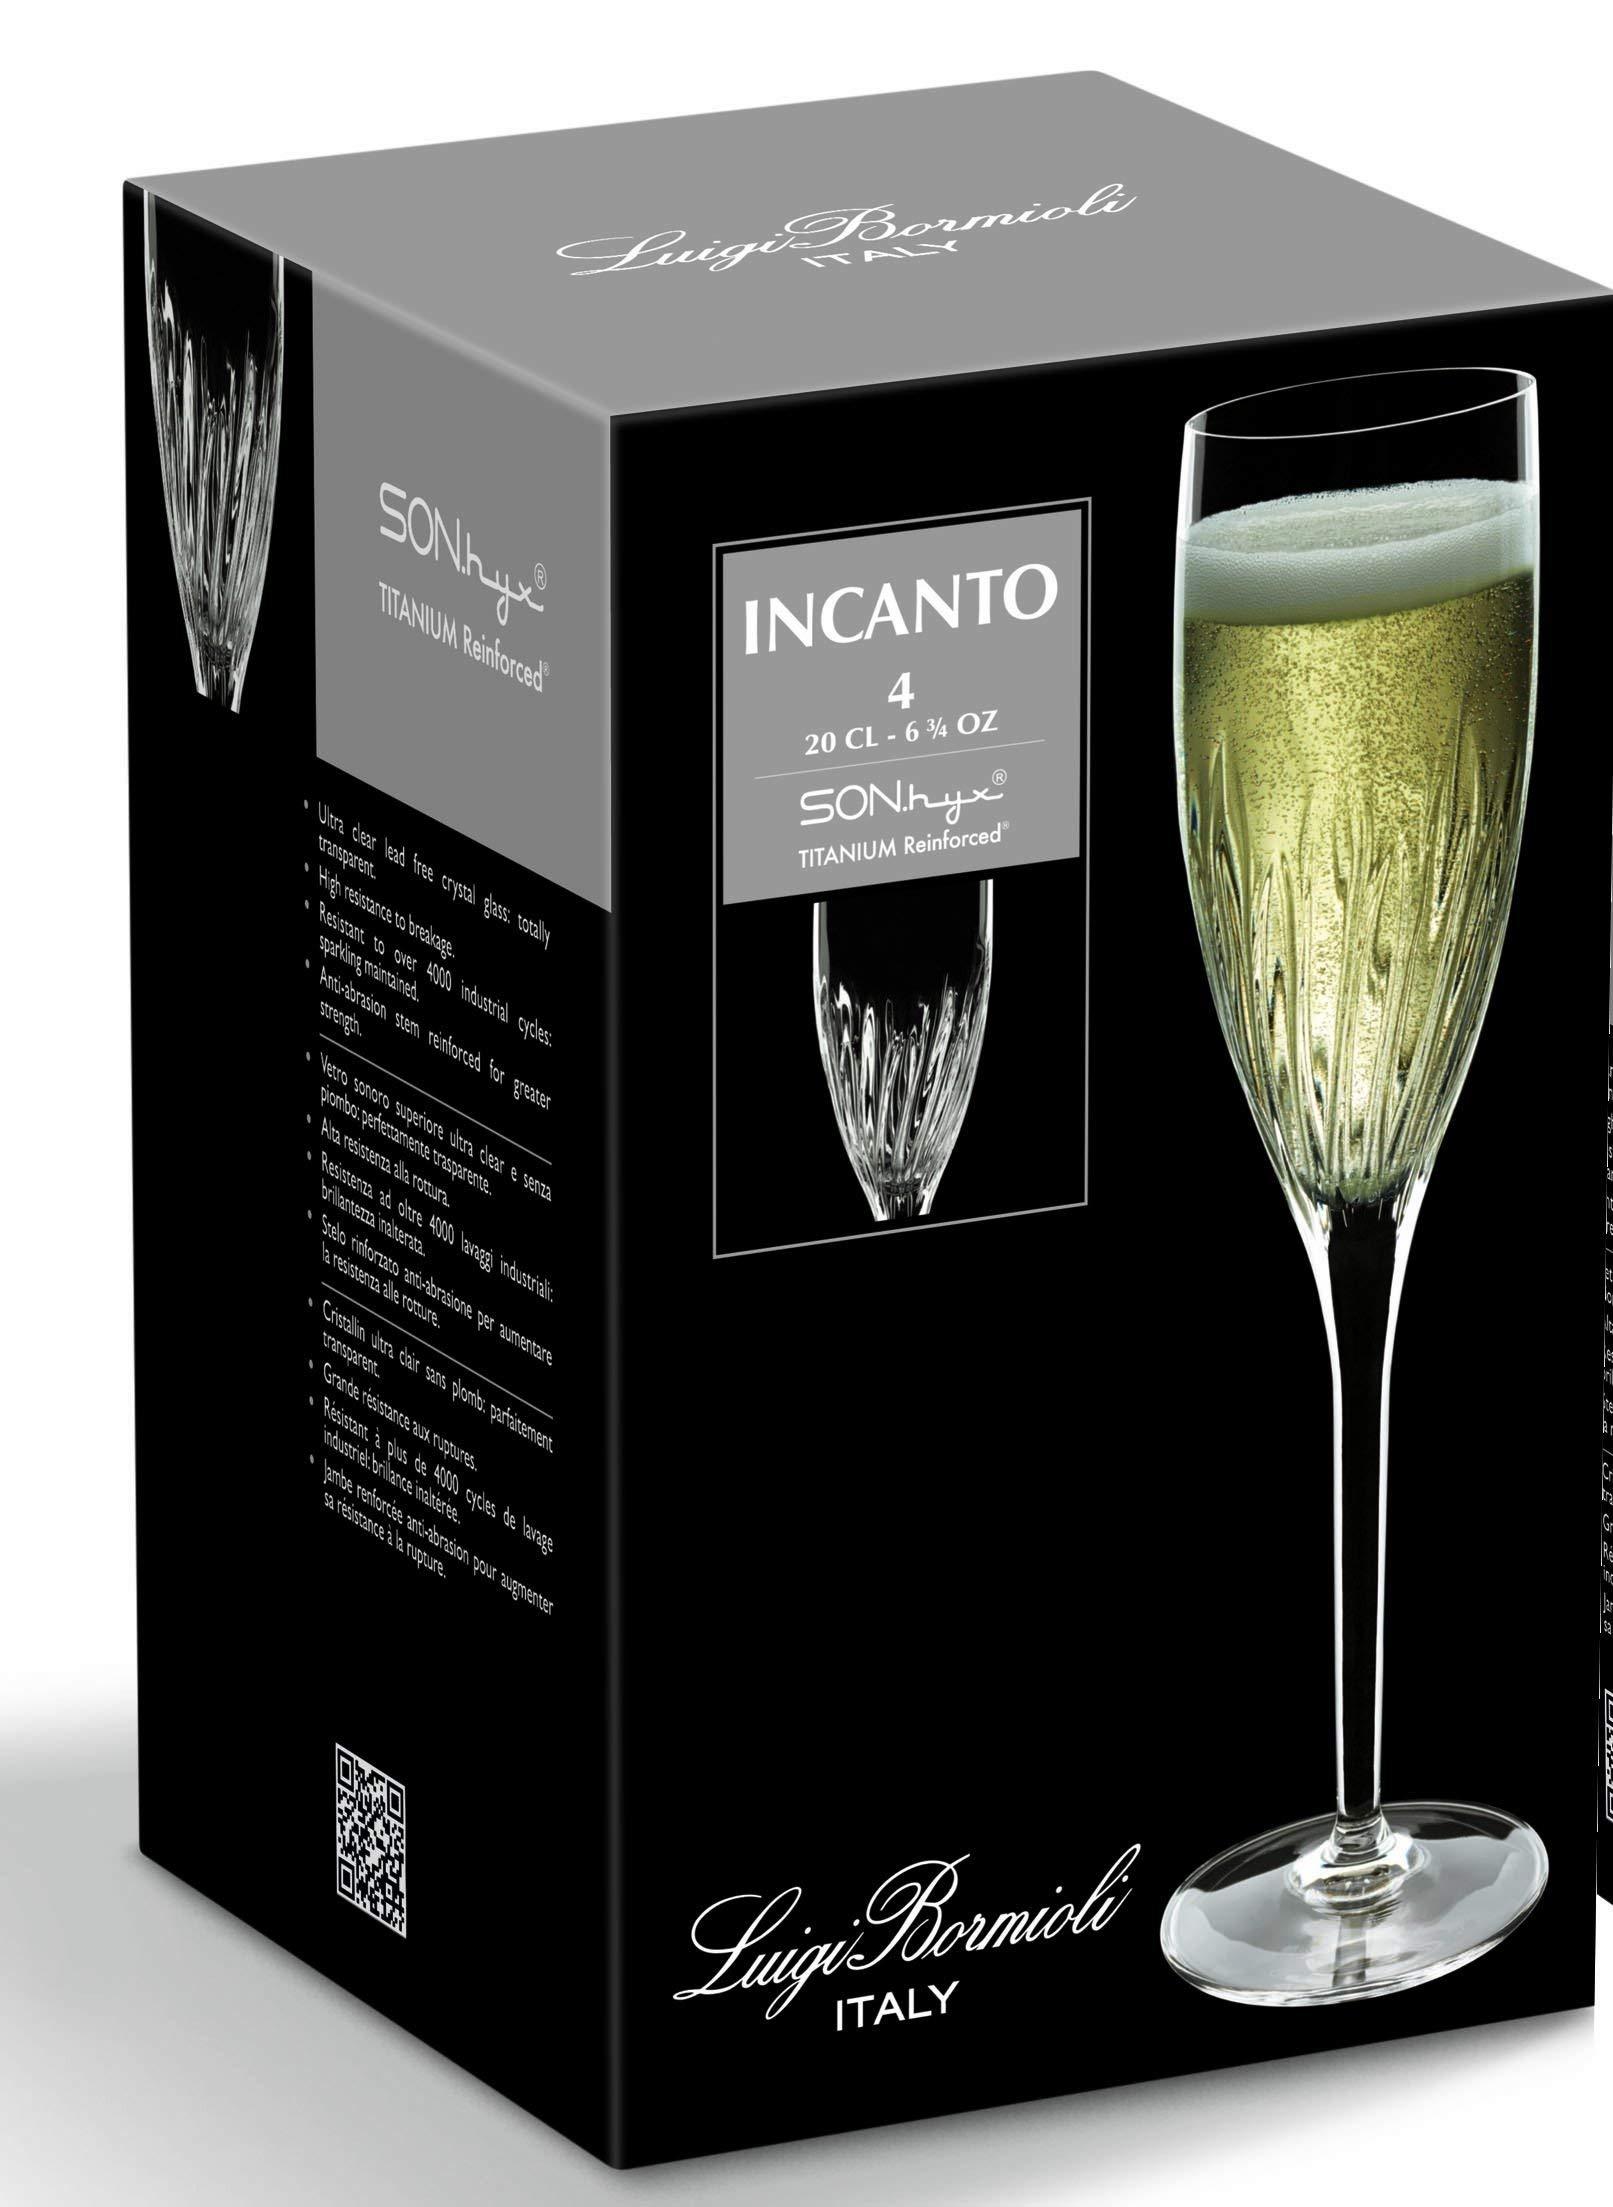 Luigi Bormioli Incanto Beverage Glass, 14.75-Ounce, Set of 4